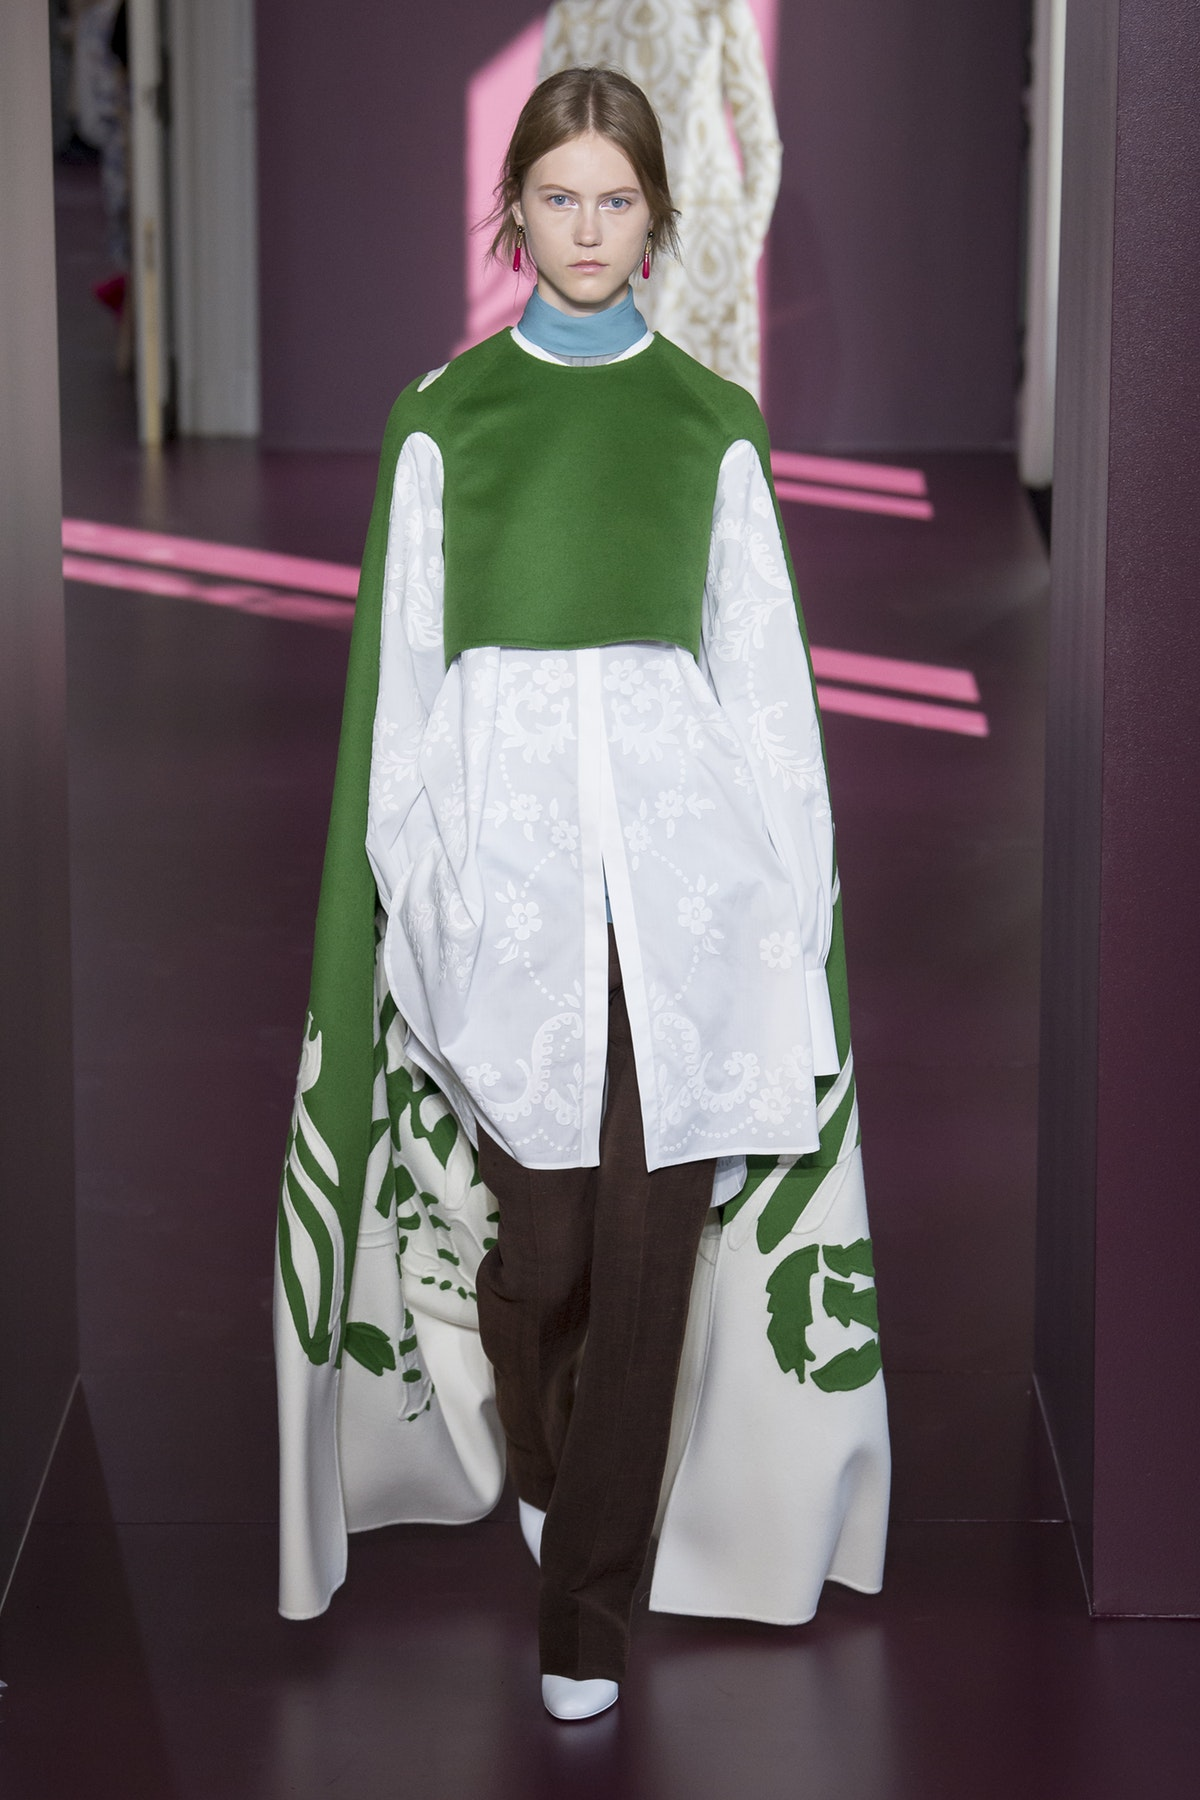 Valentino Autumn 2017 Haute Couture, image via The Business Of Fashion